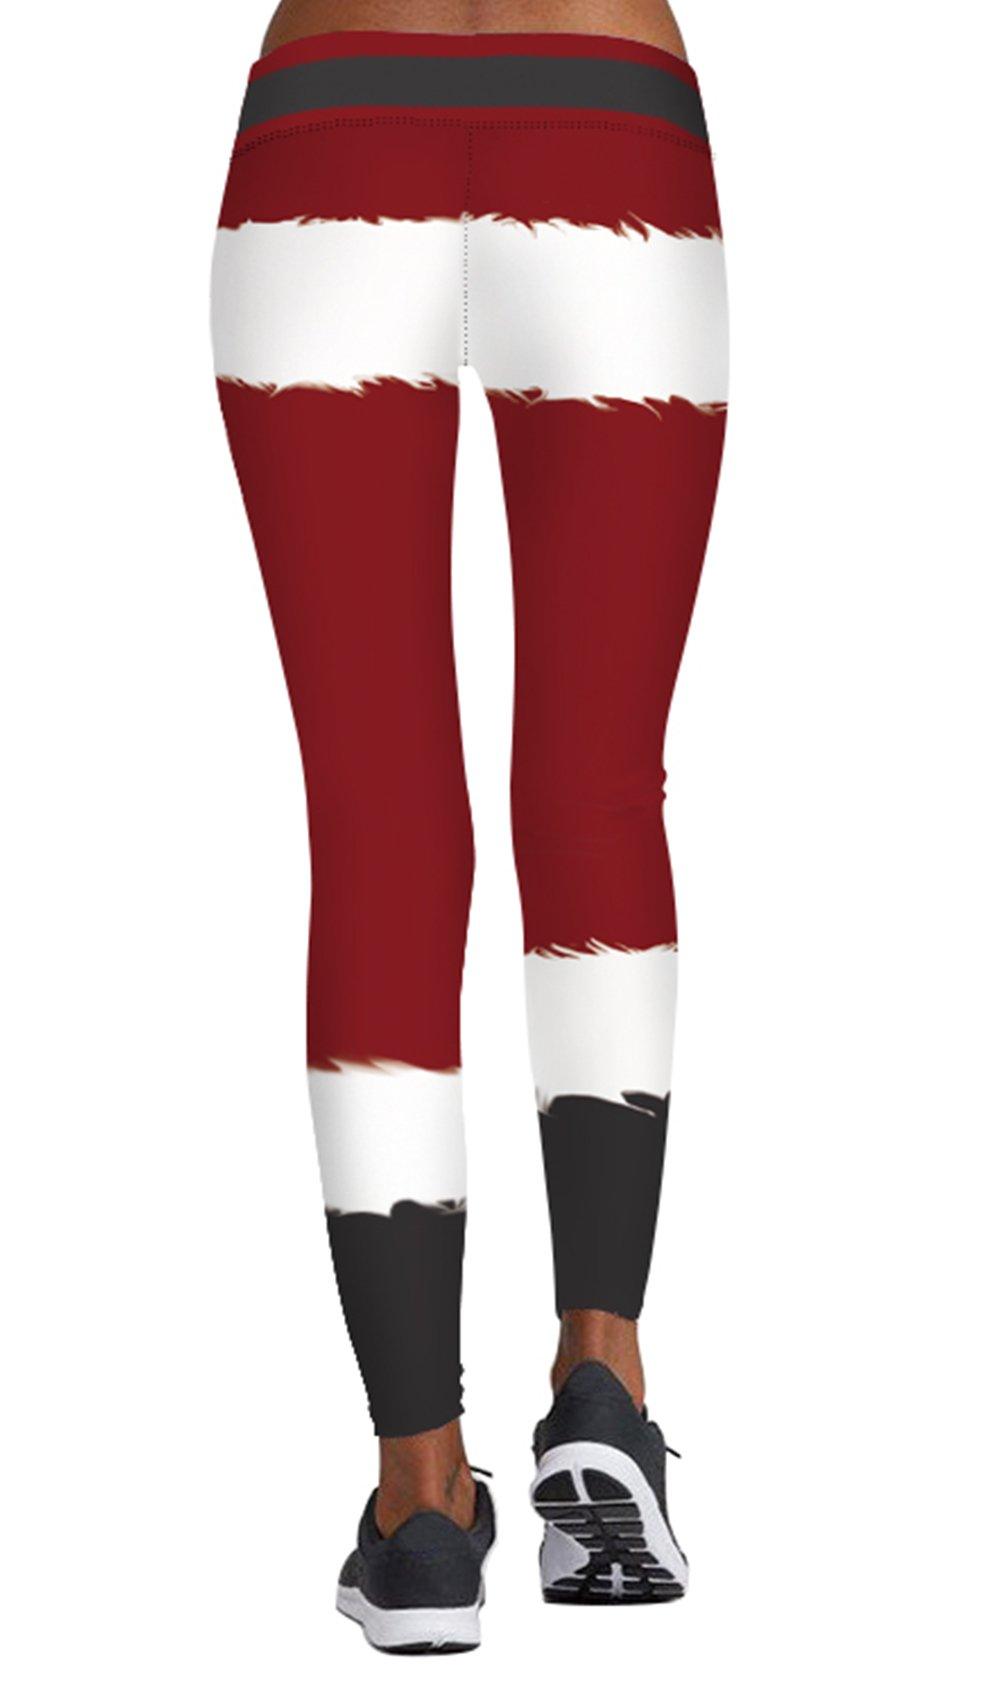 DawnRaid Santa Claus Funny Print Leggings for Christmas Party Costume Cute Cosplay Dress